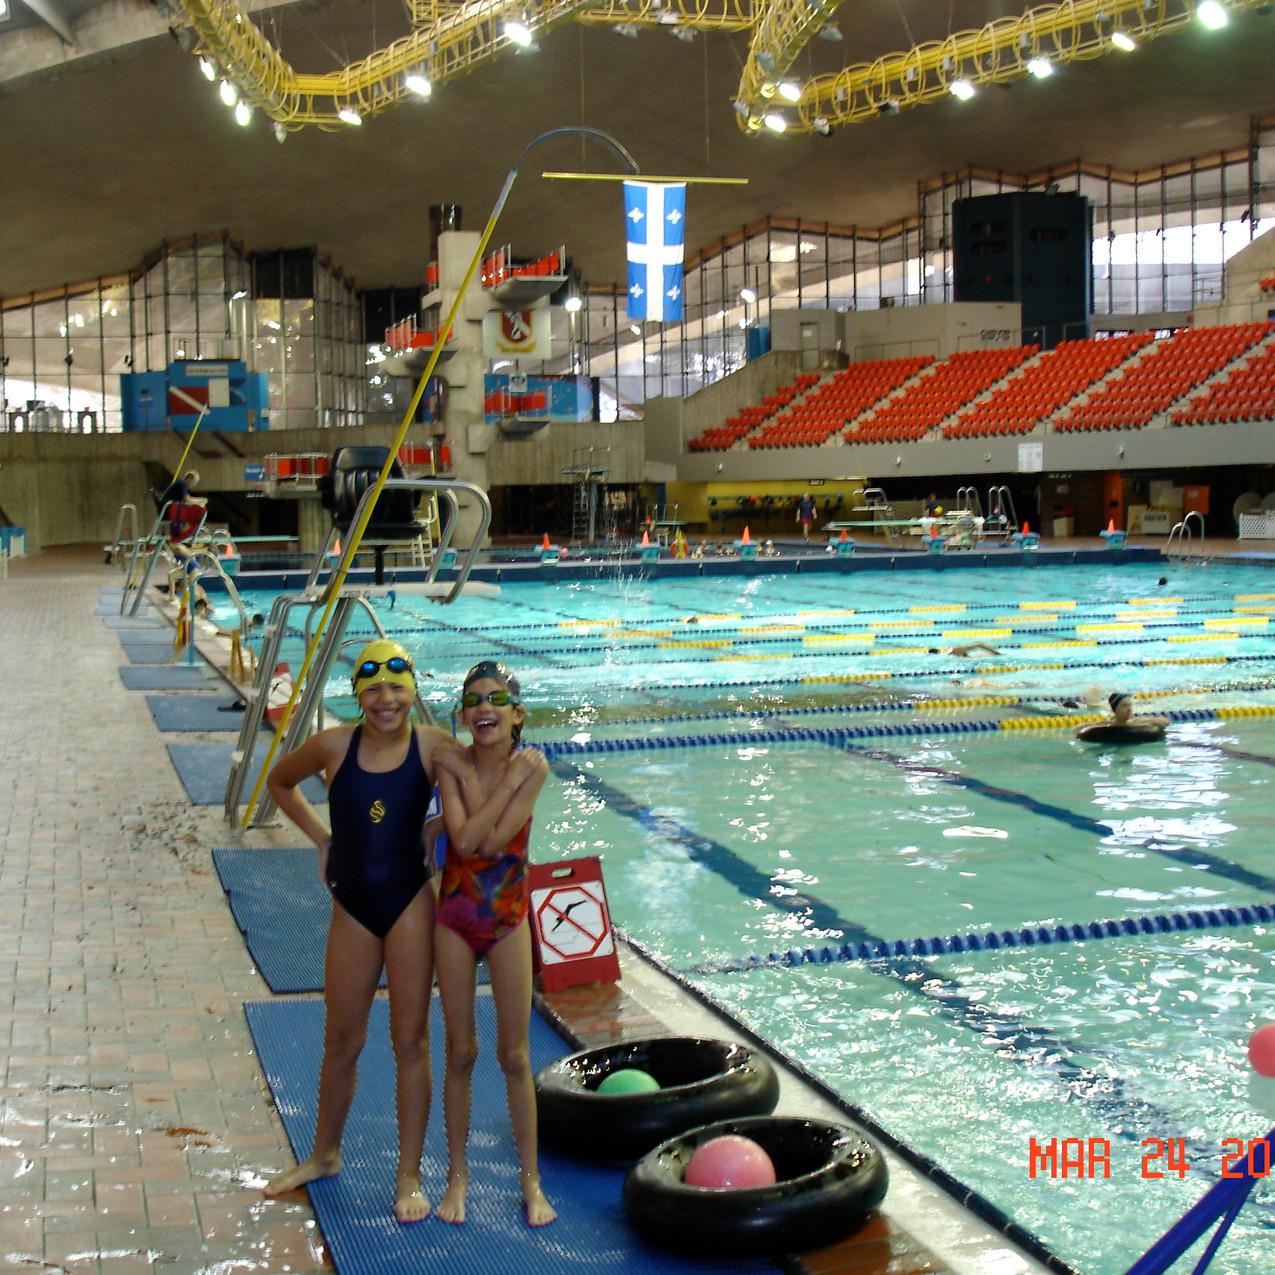 Lane #0 - Montreal Olympic Pool